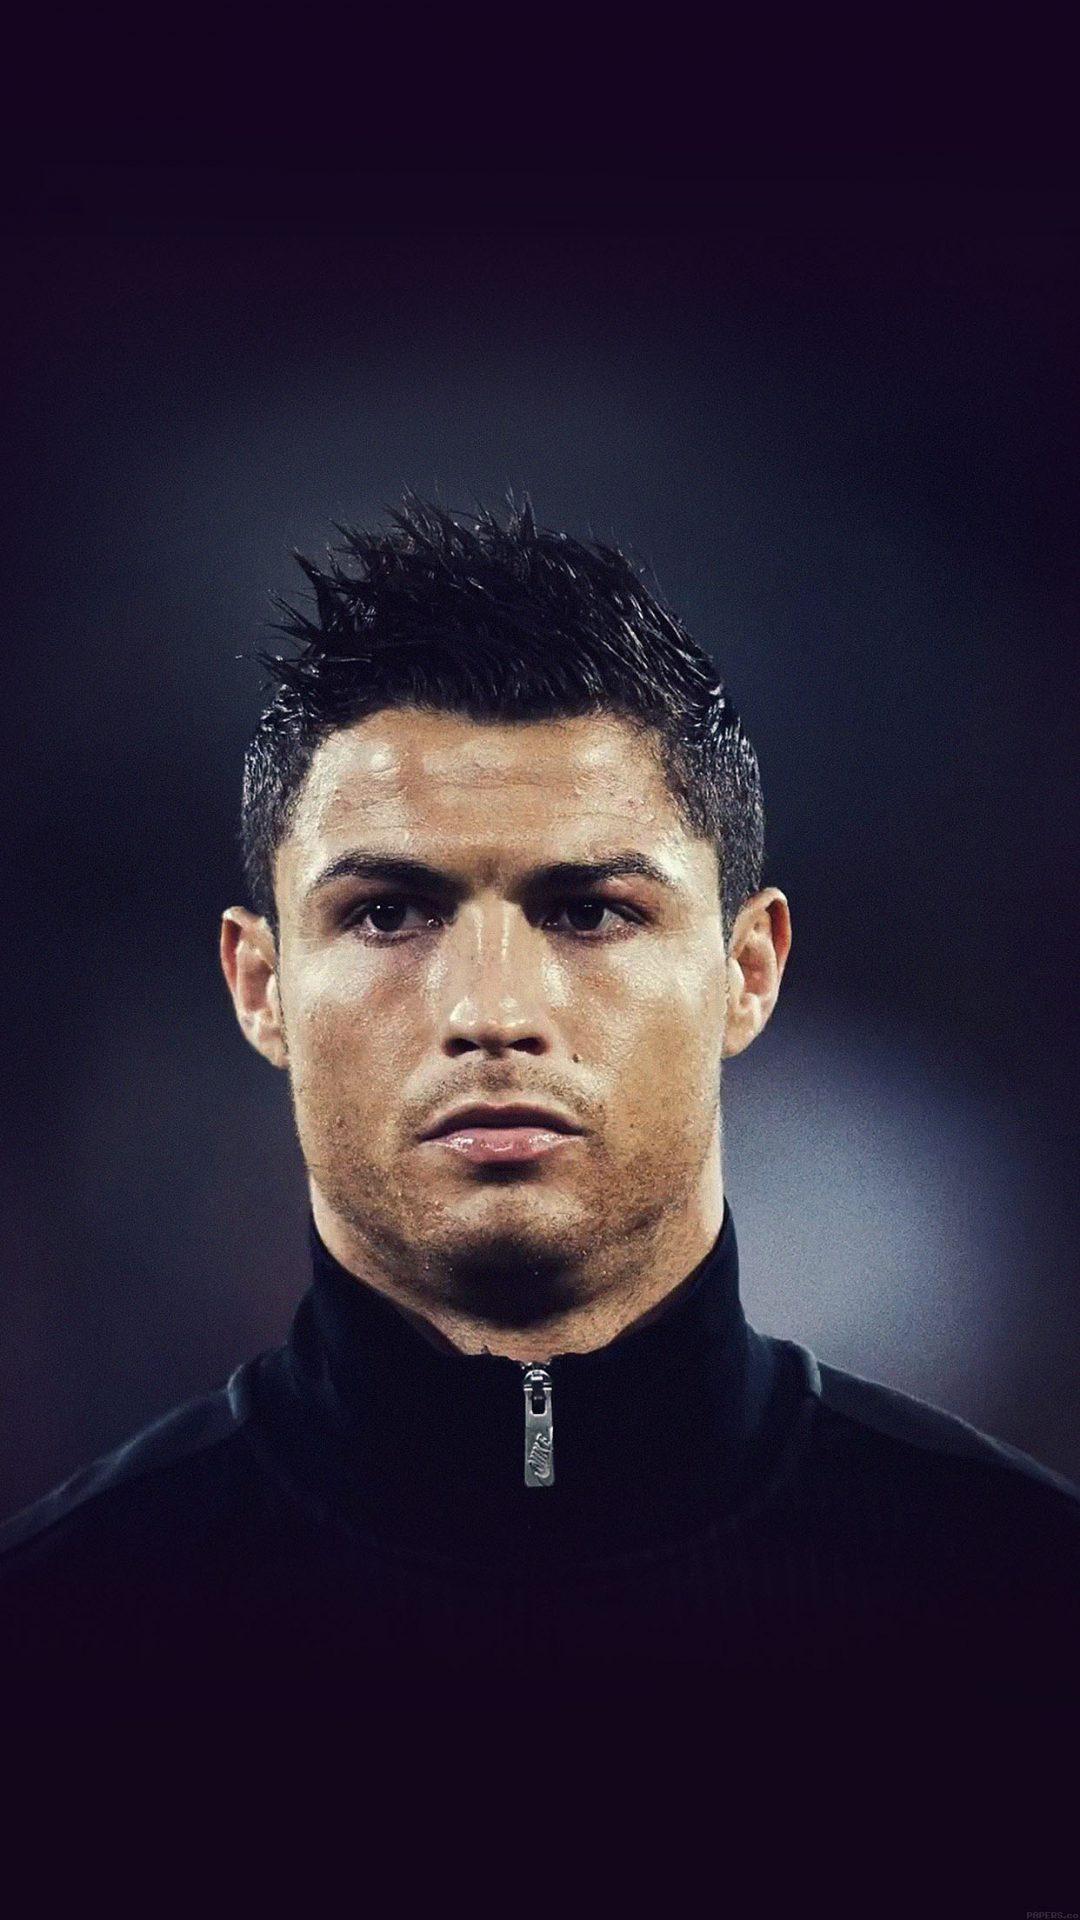 Cristiano Ronaldo Sports Face